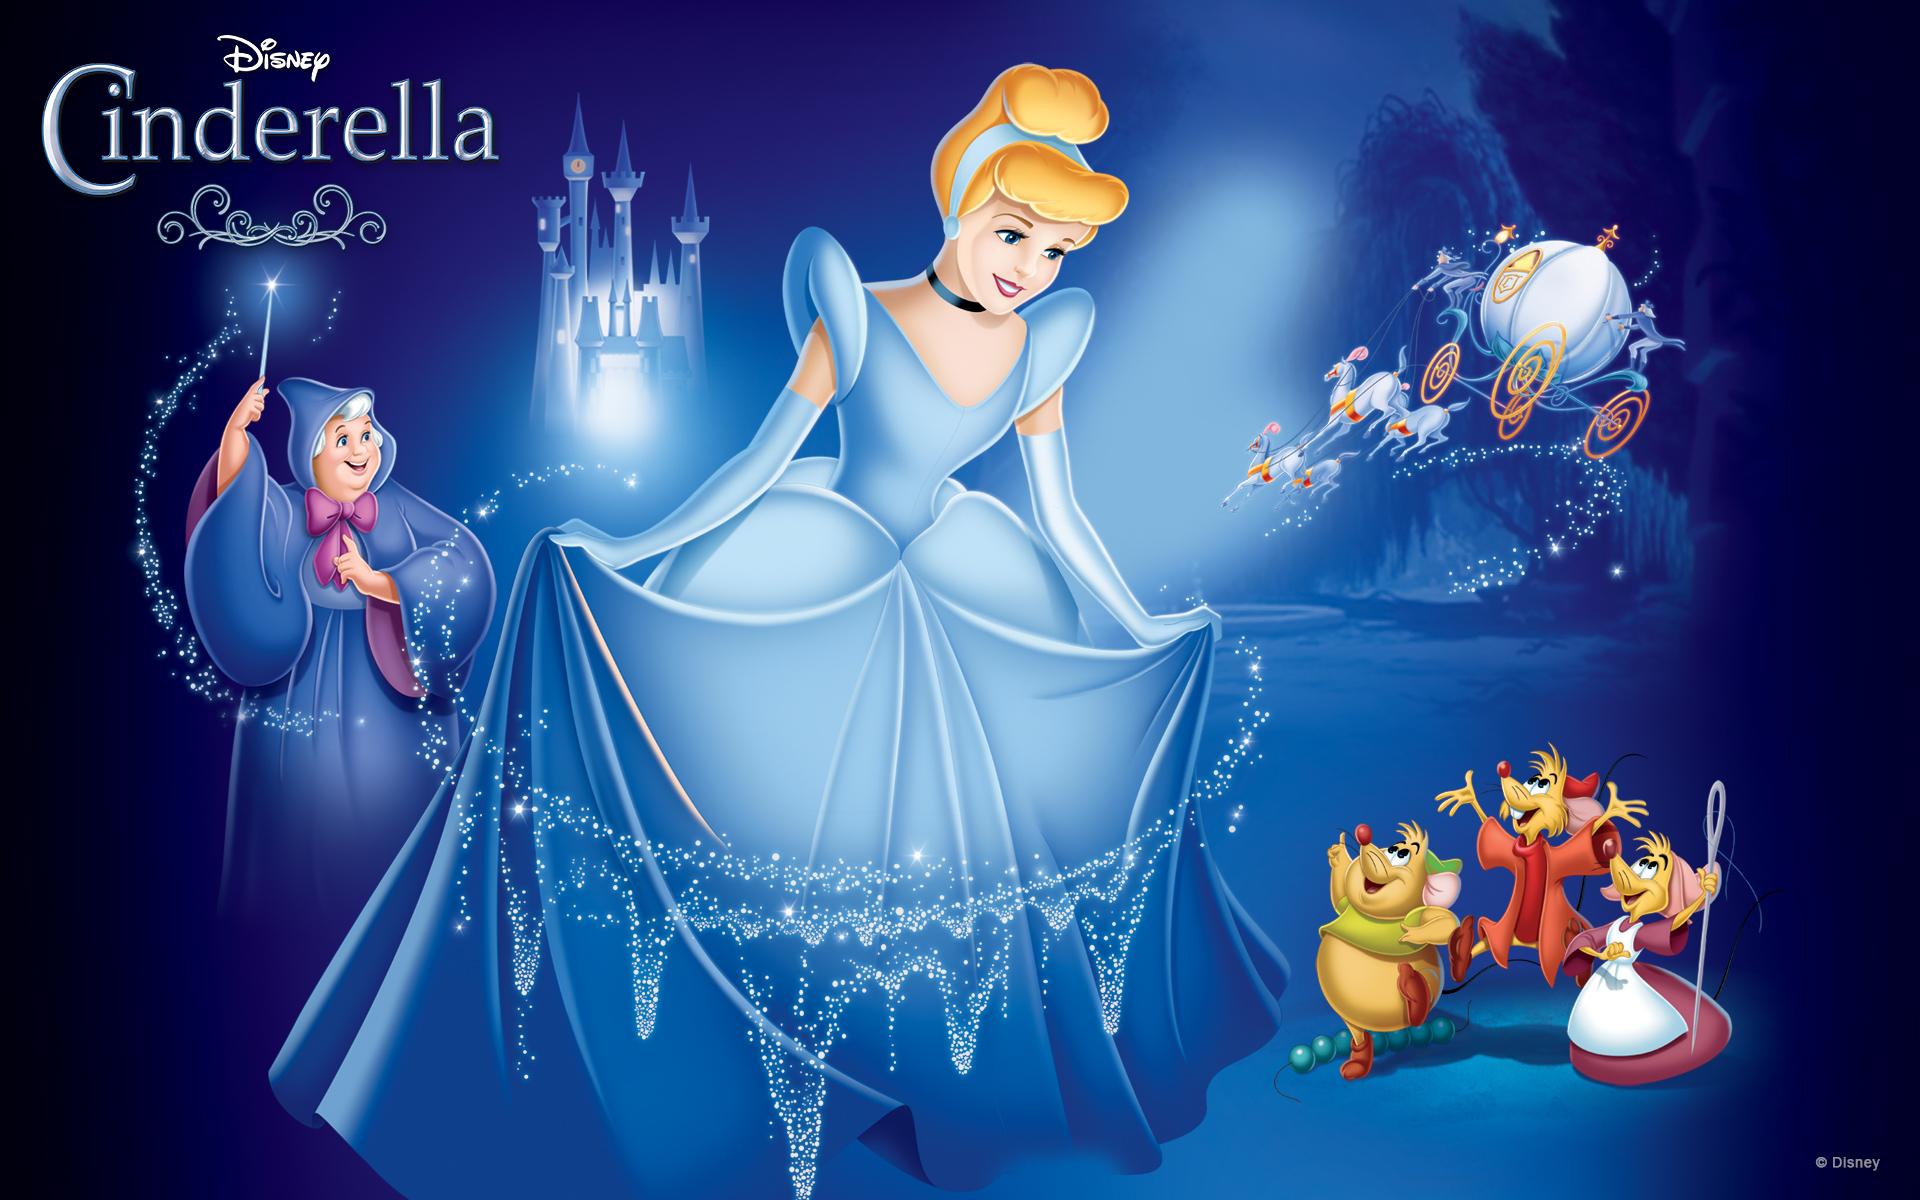 disney-cinderella-animation-movie-film-key-art